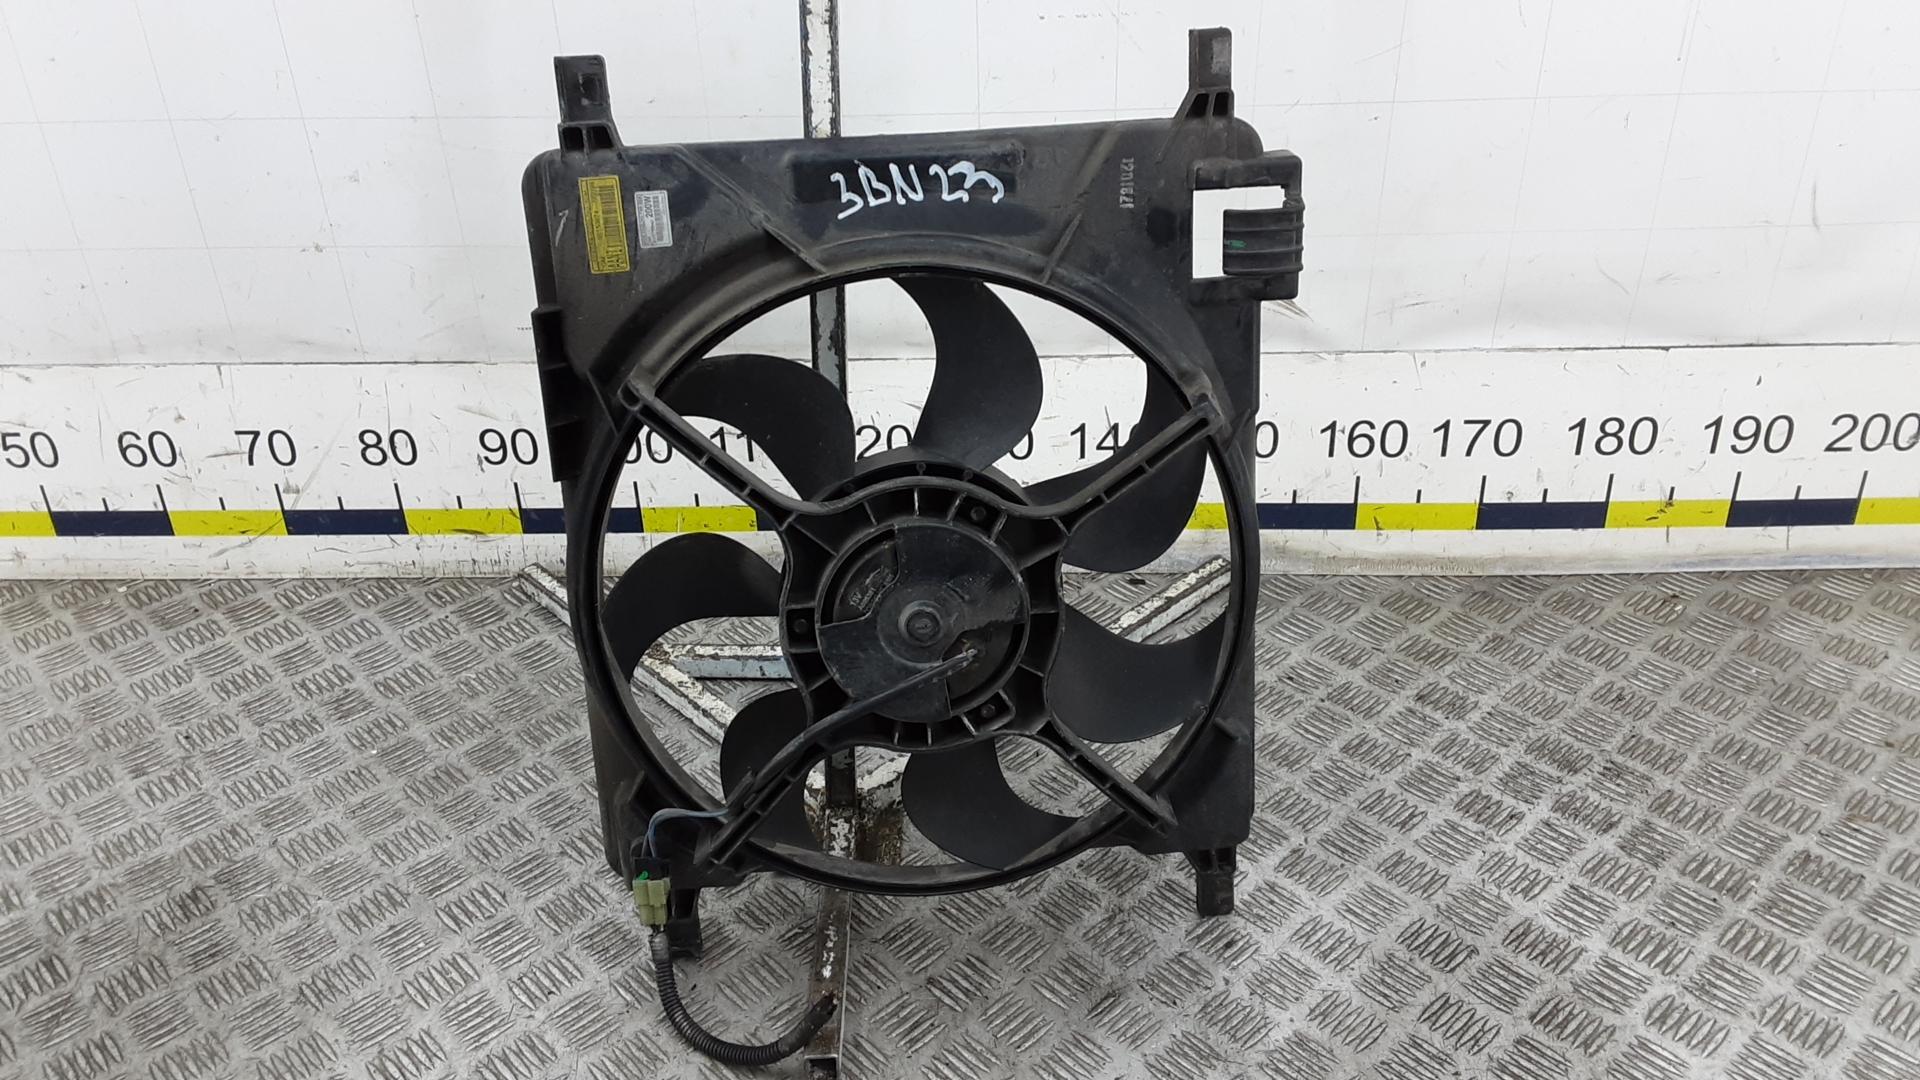 Вентилятор радиатора, CHEVROLET, SPARK M300, 2012